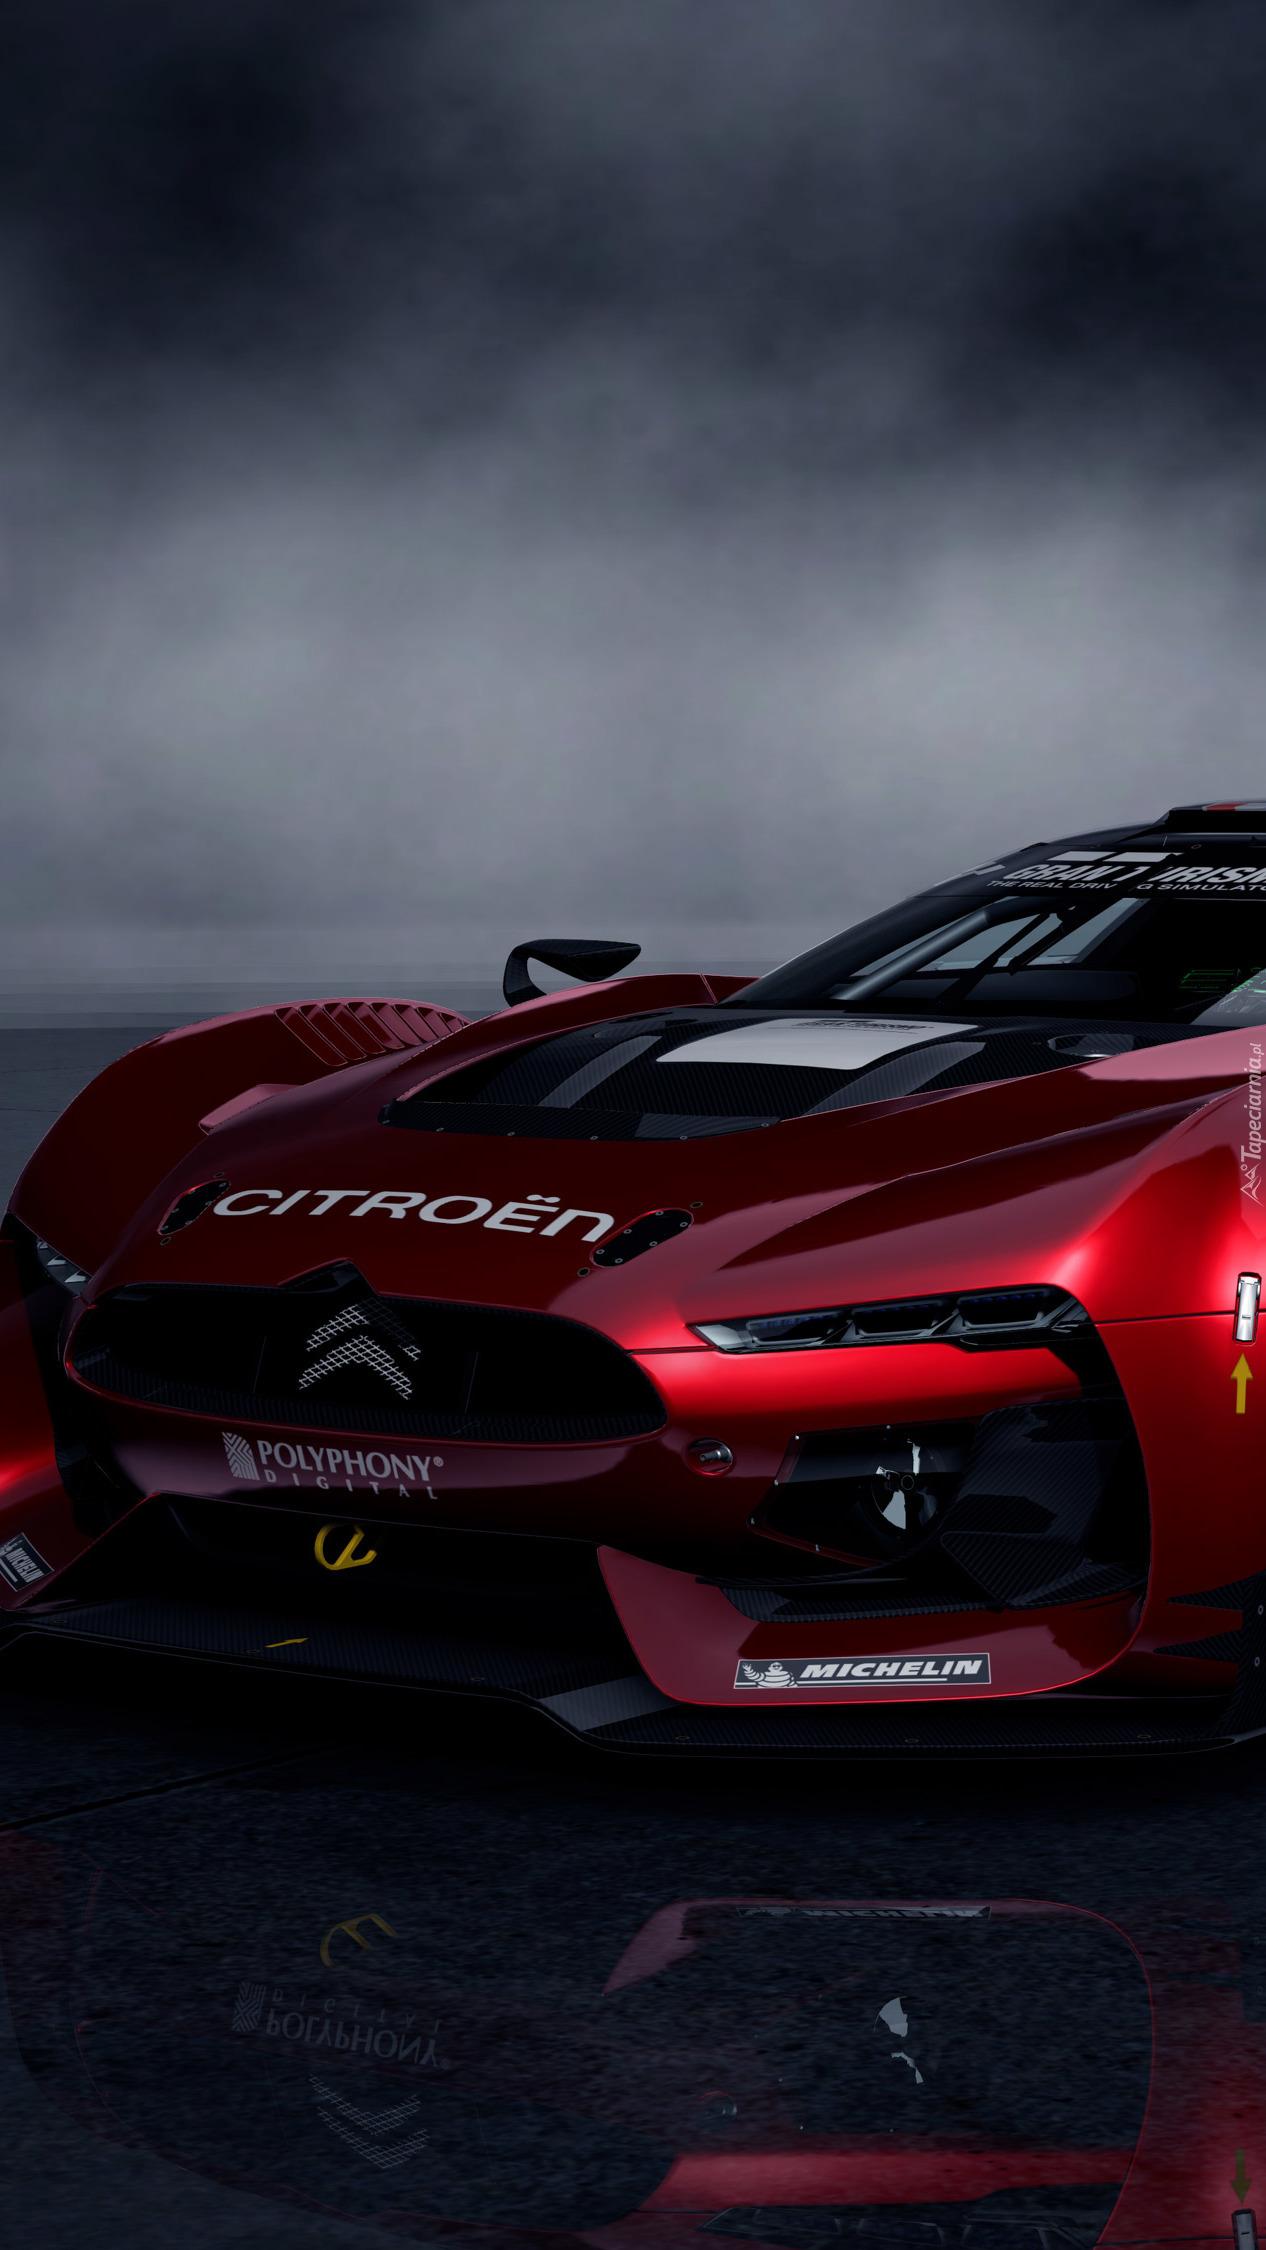 Czerwony Citroen Gran Turismo